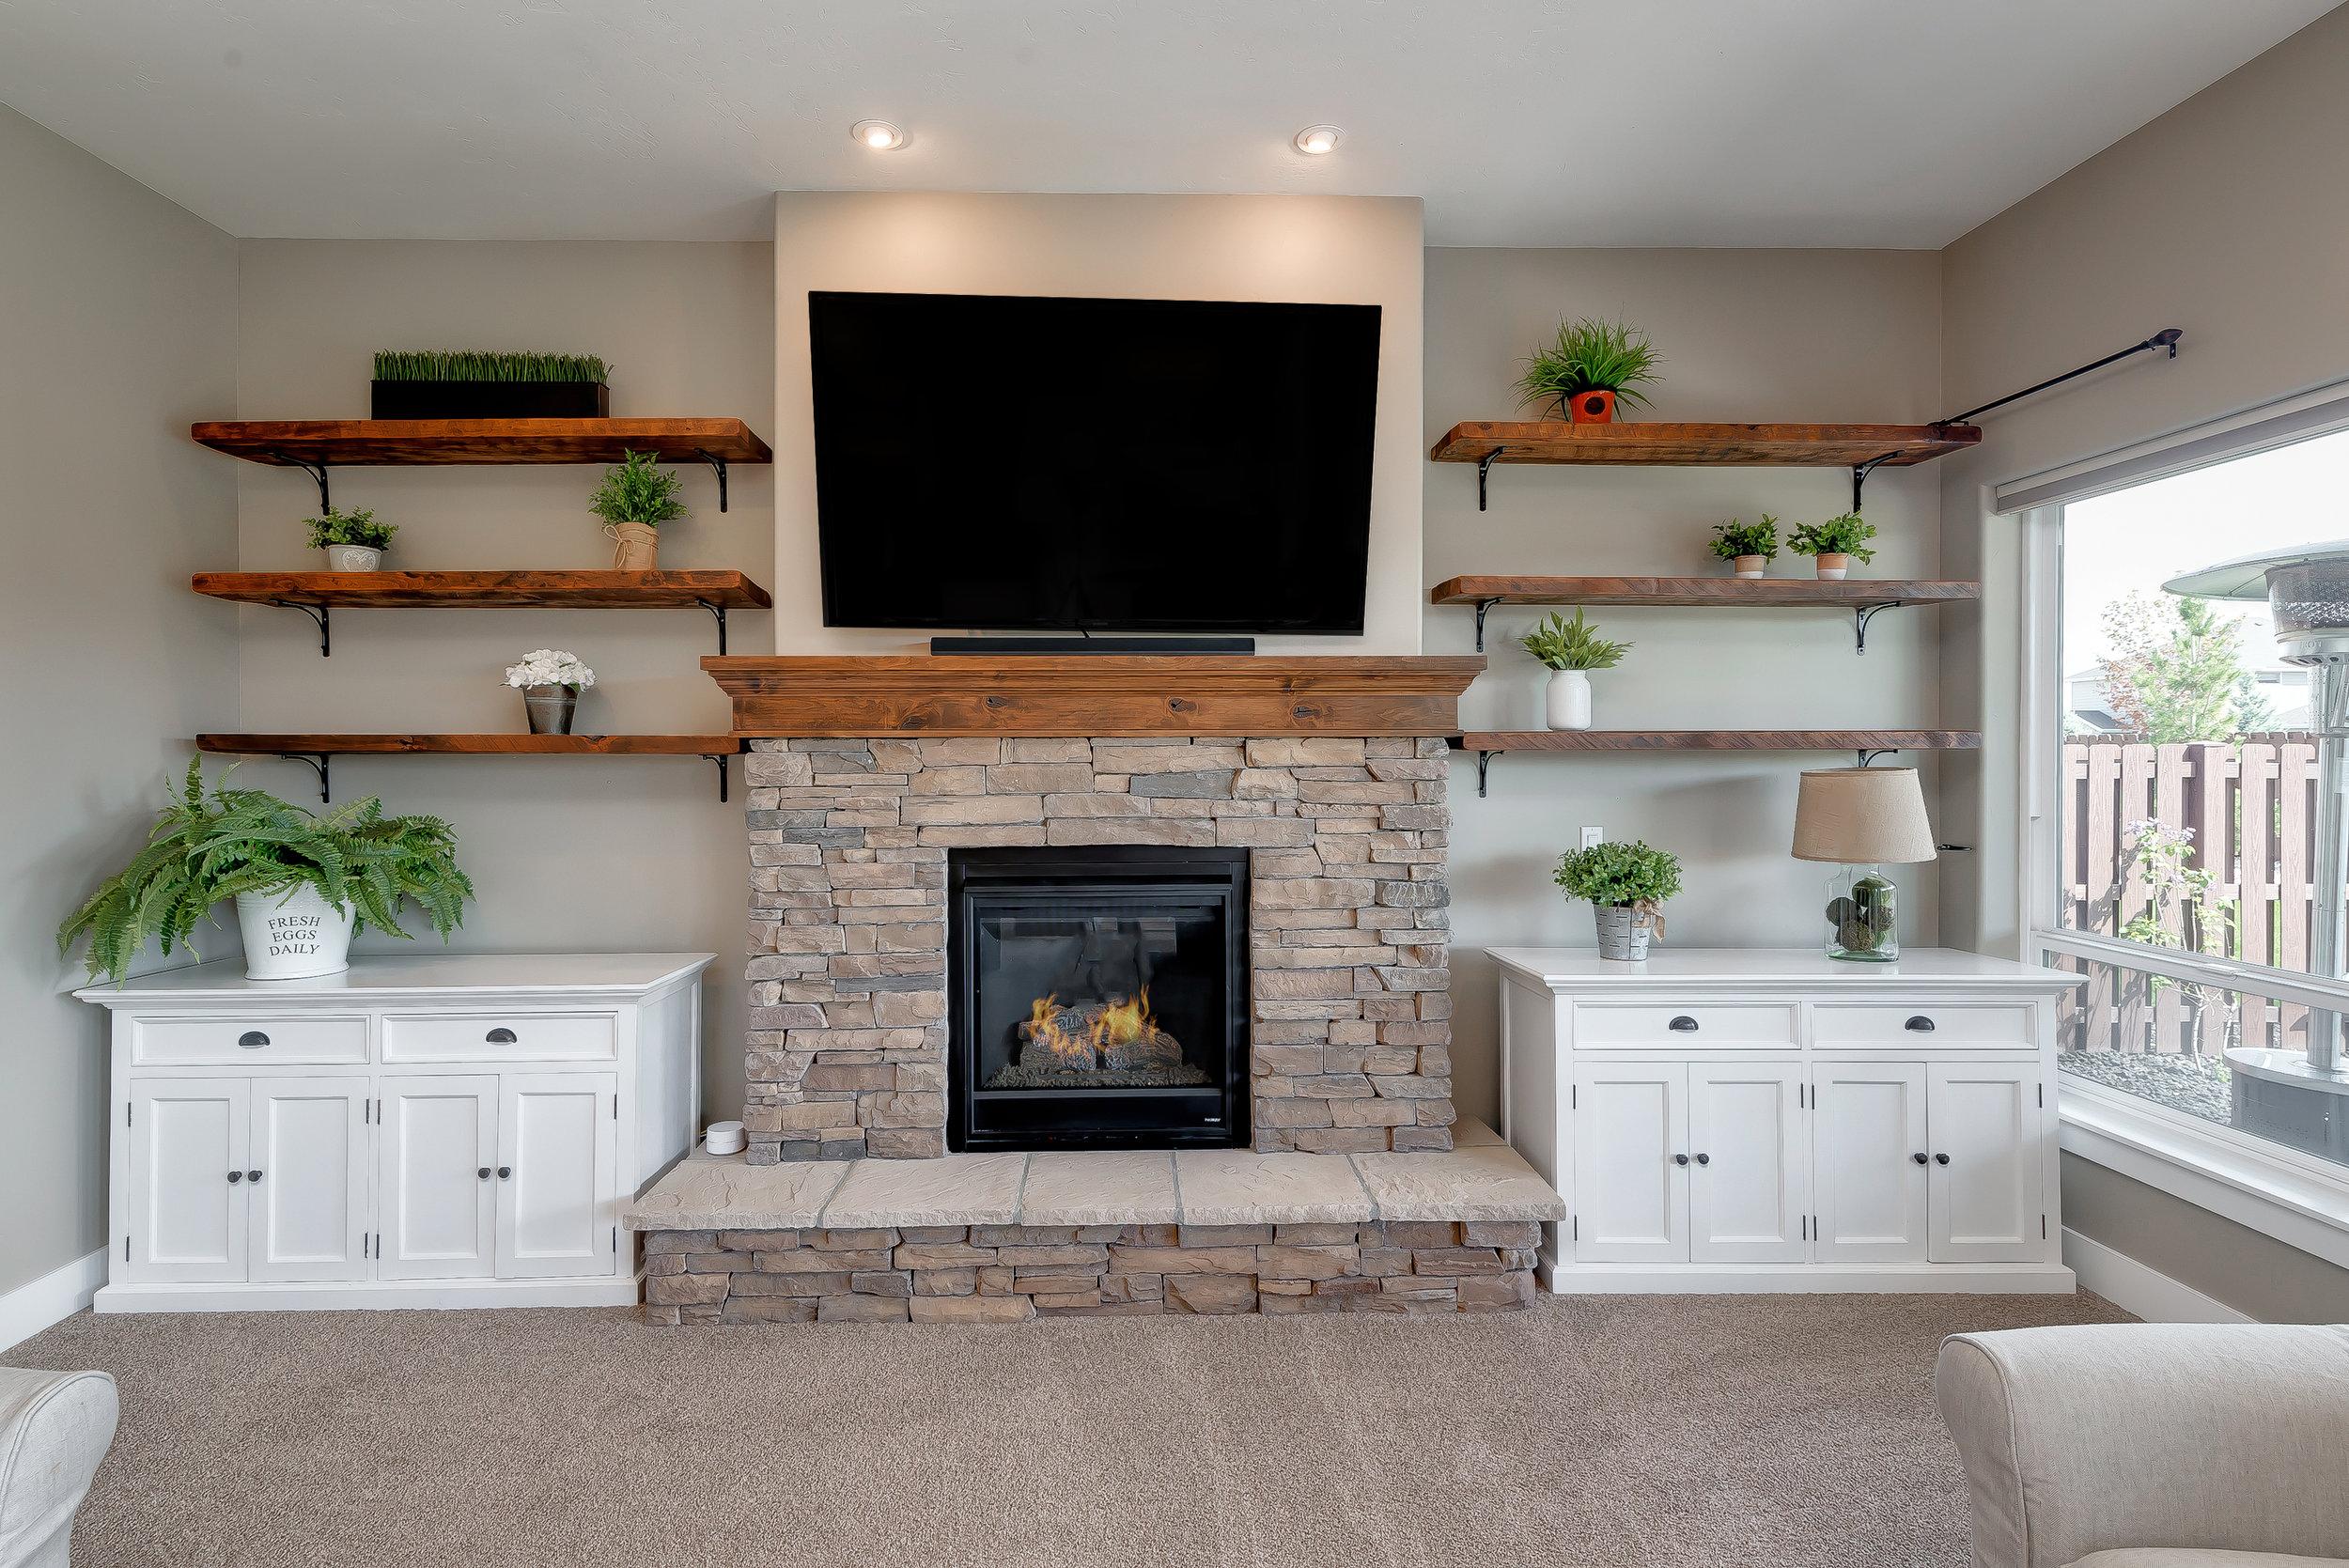 23-Fireplace.jpg